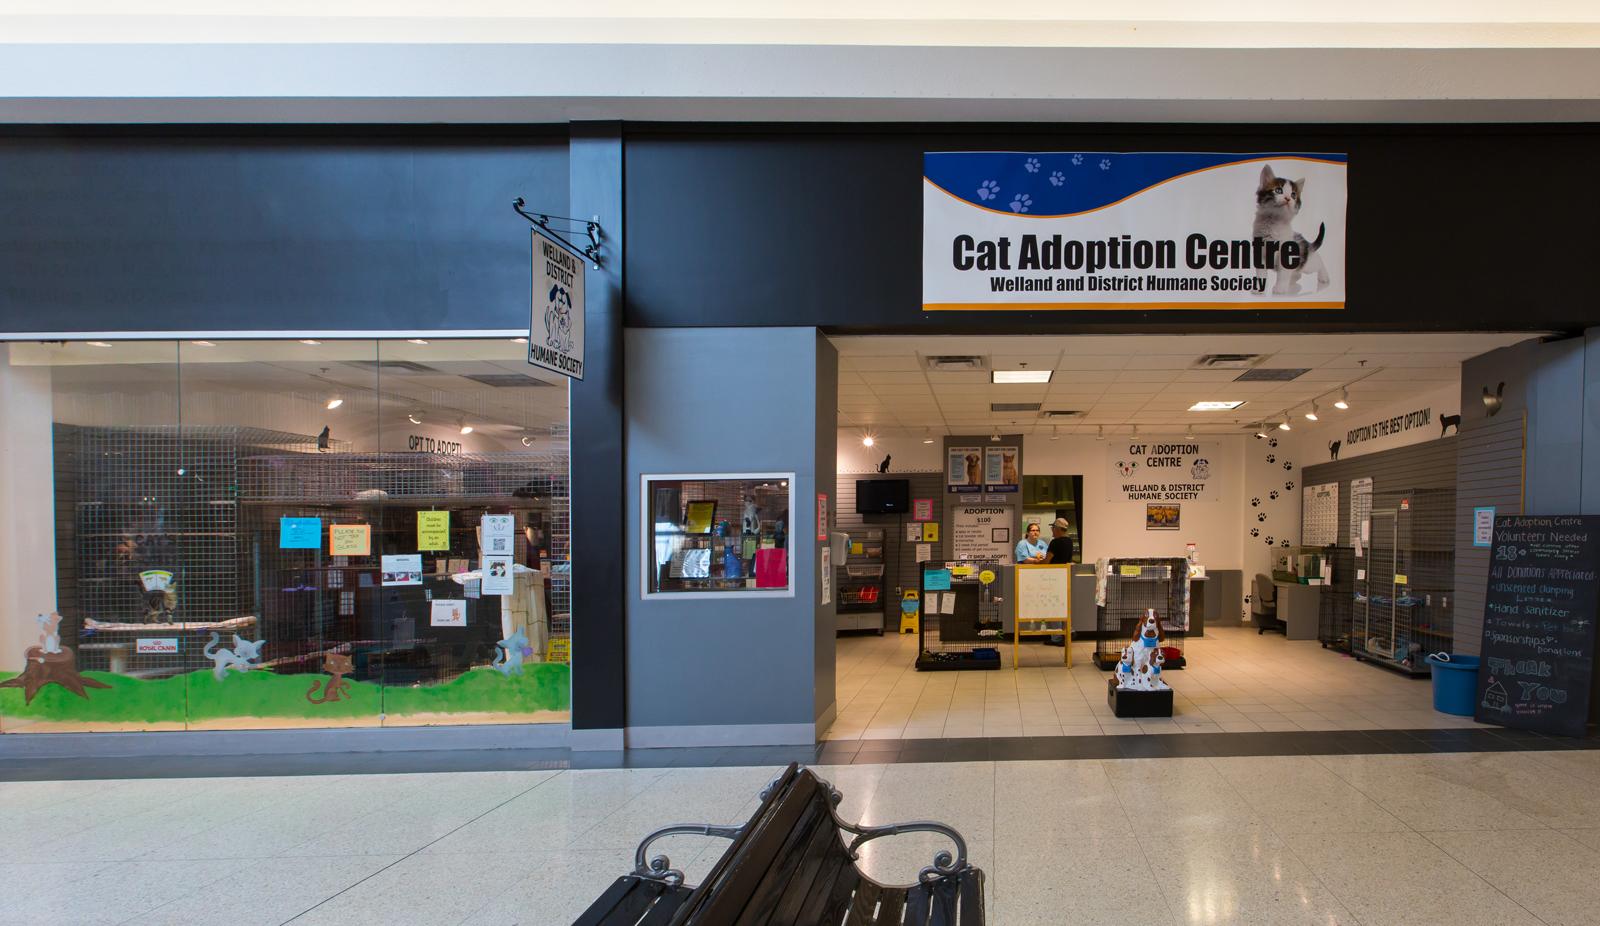 Cat Adoption Centre Welland SPCA